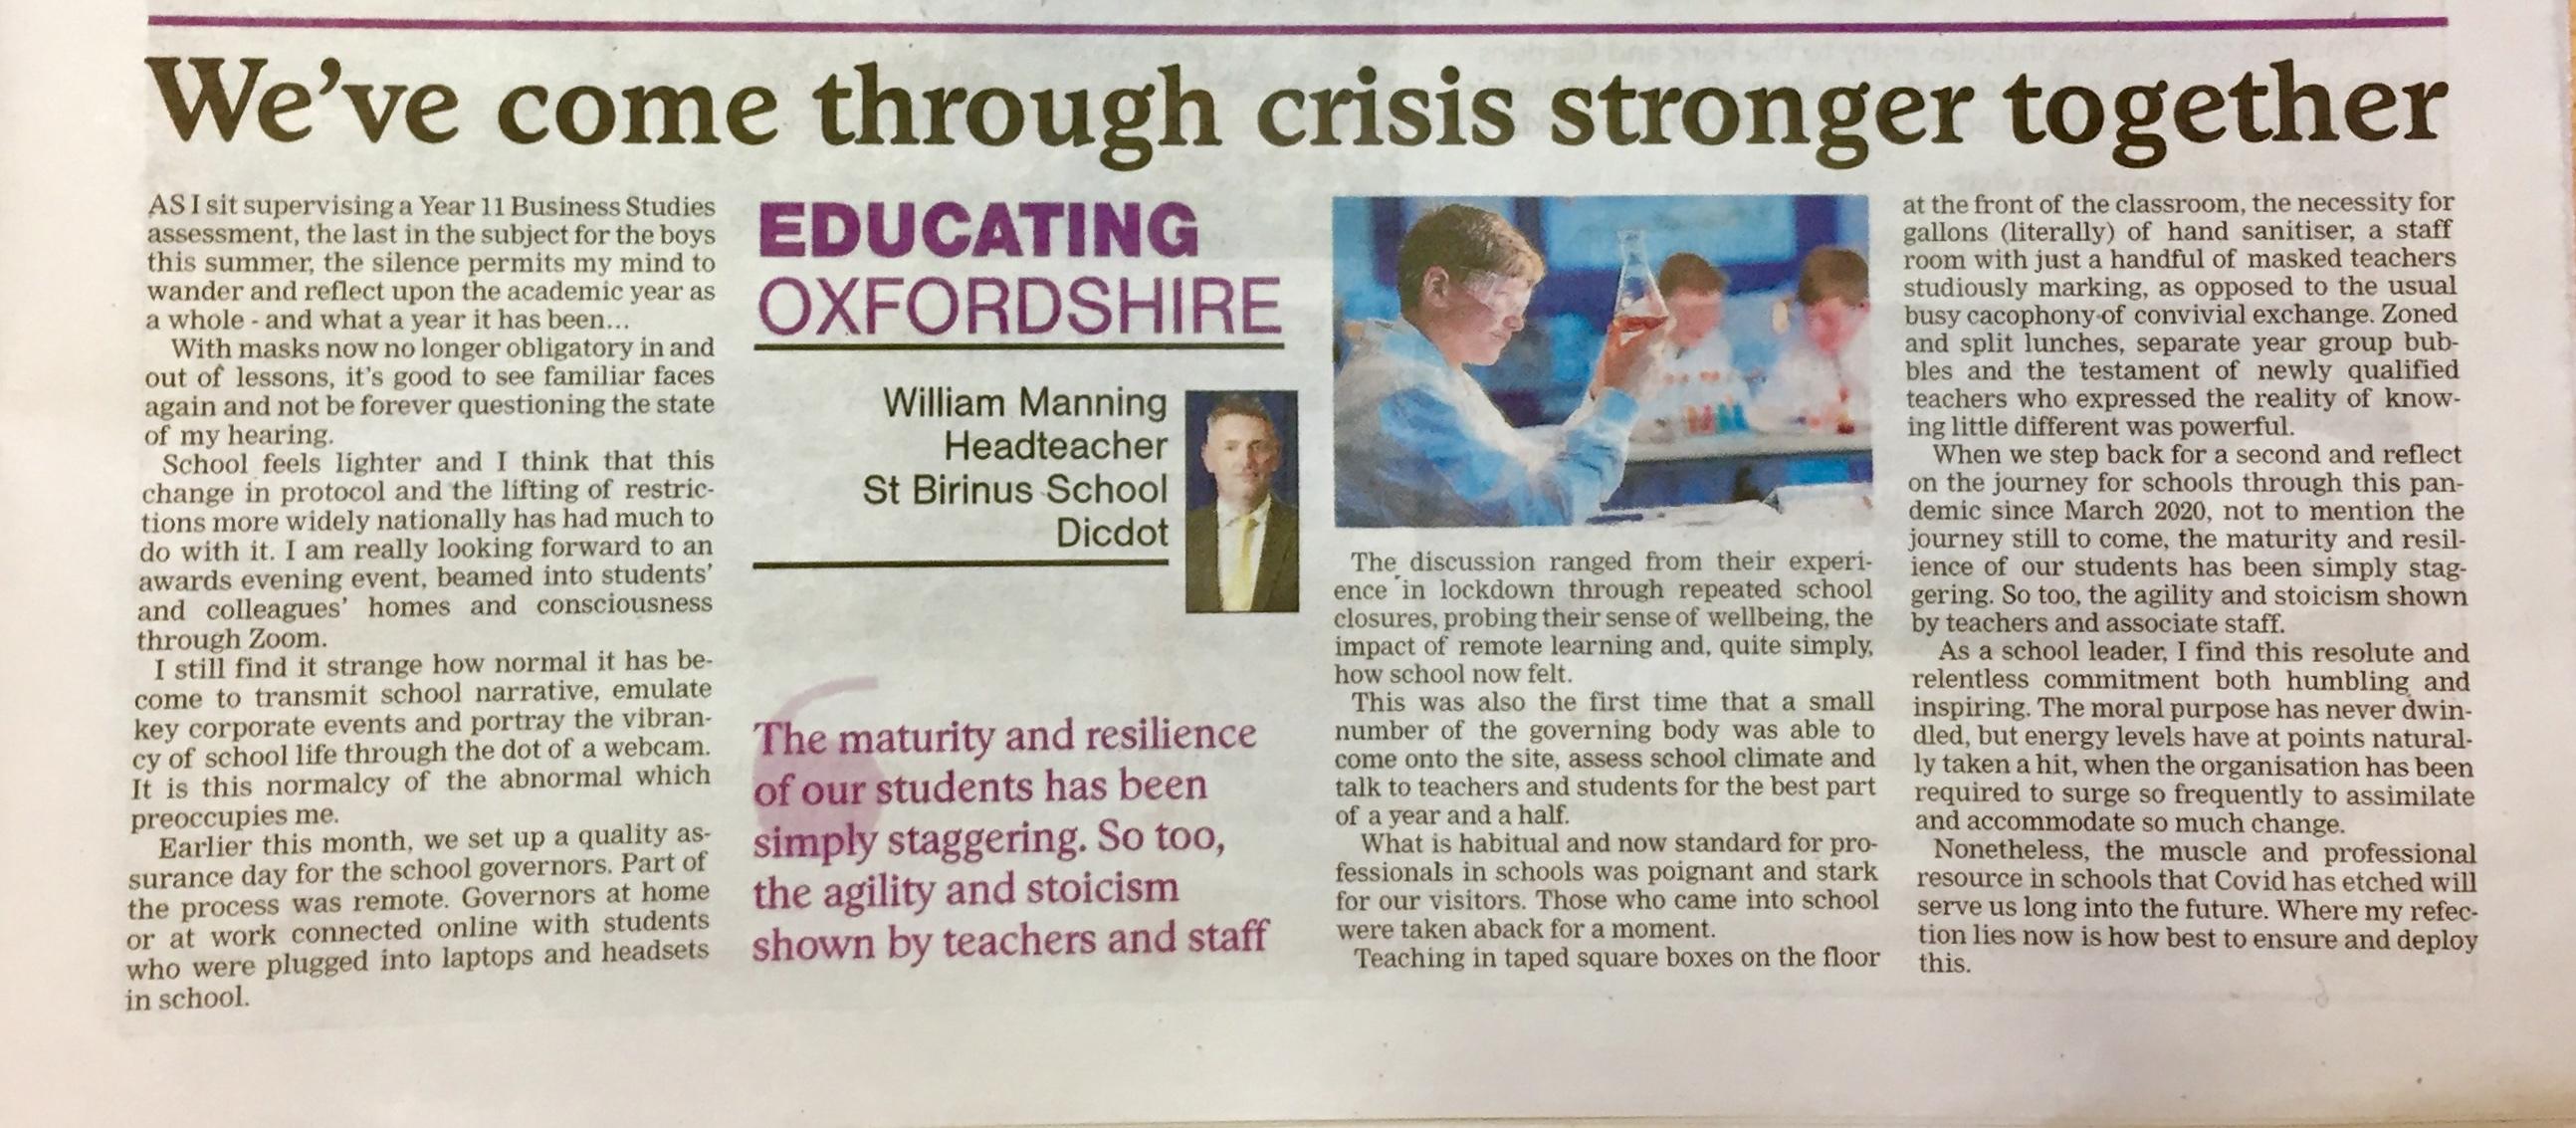 Wjm educating oxfordshire 27 05 21